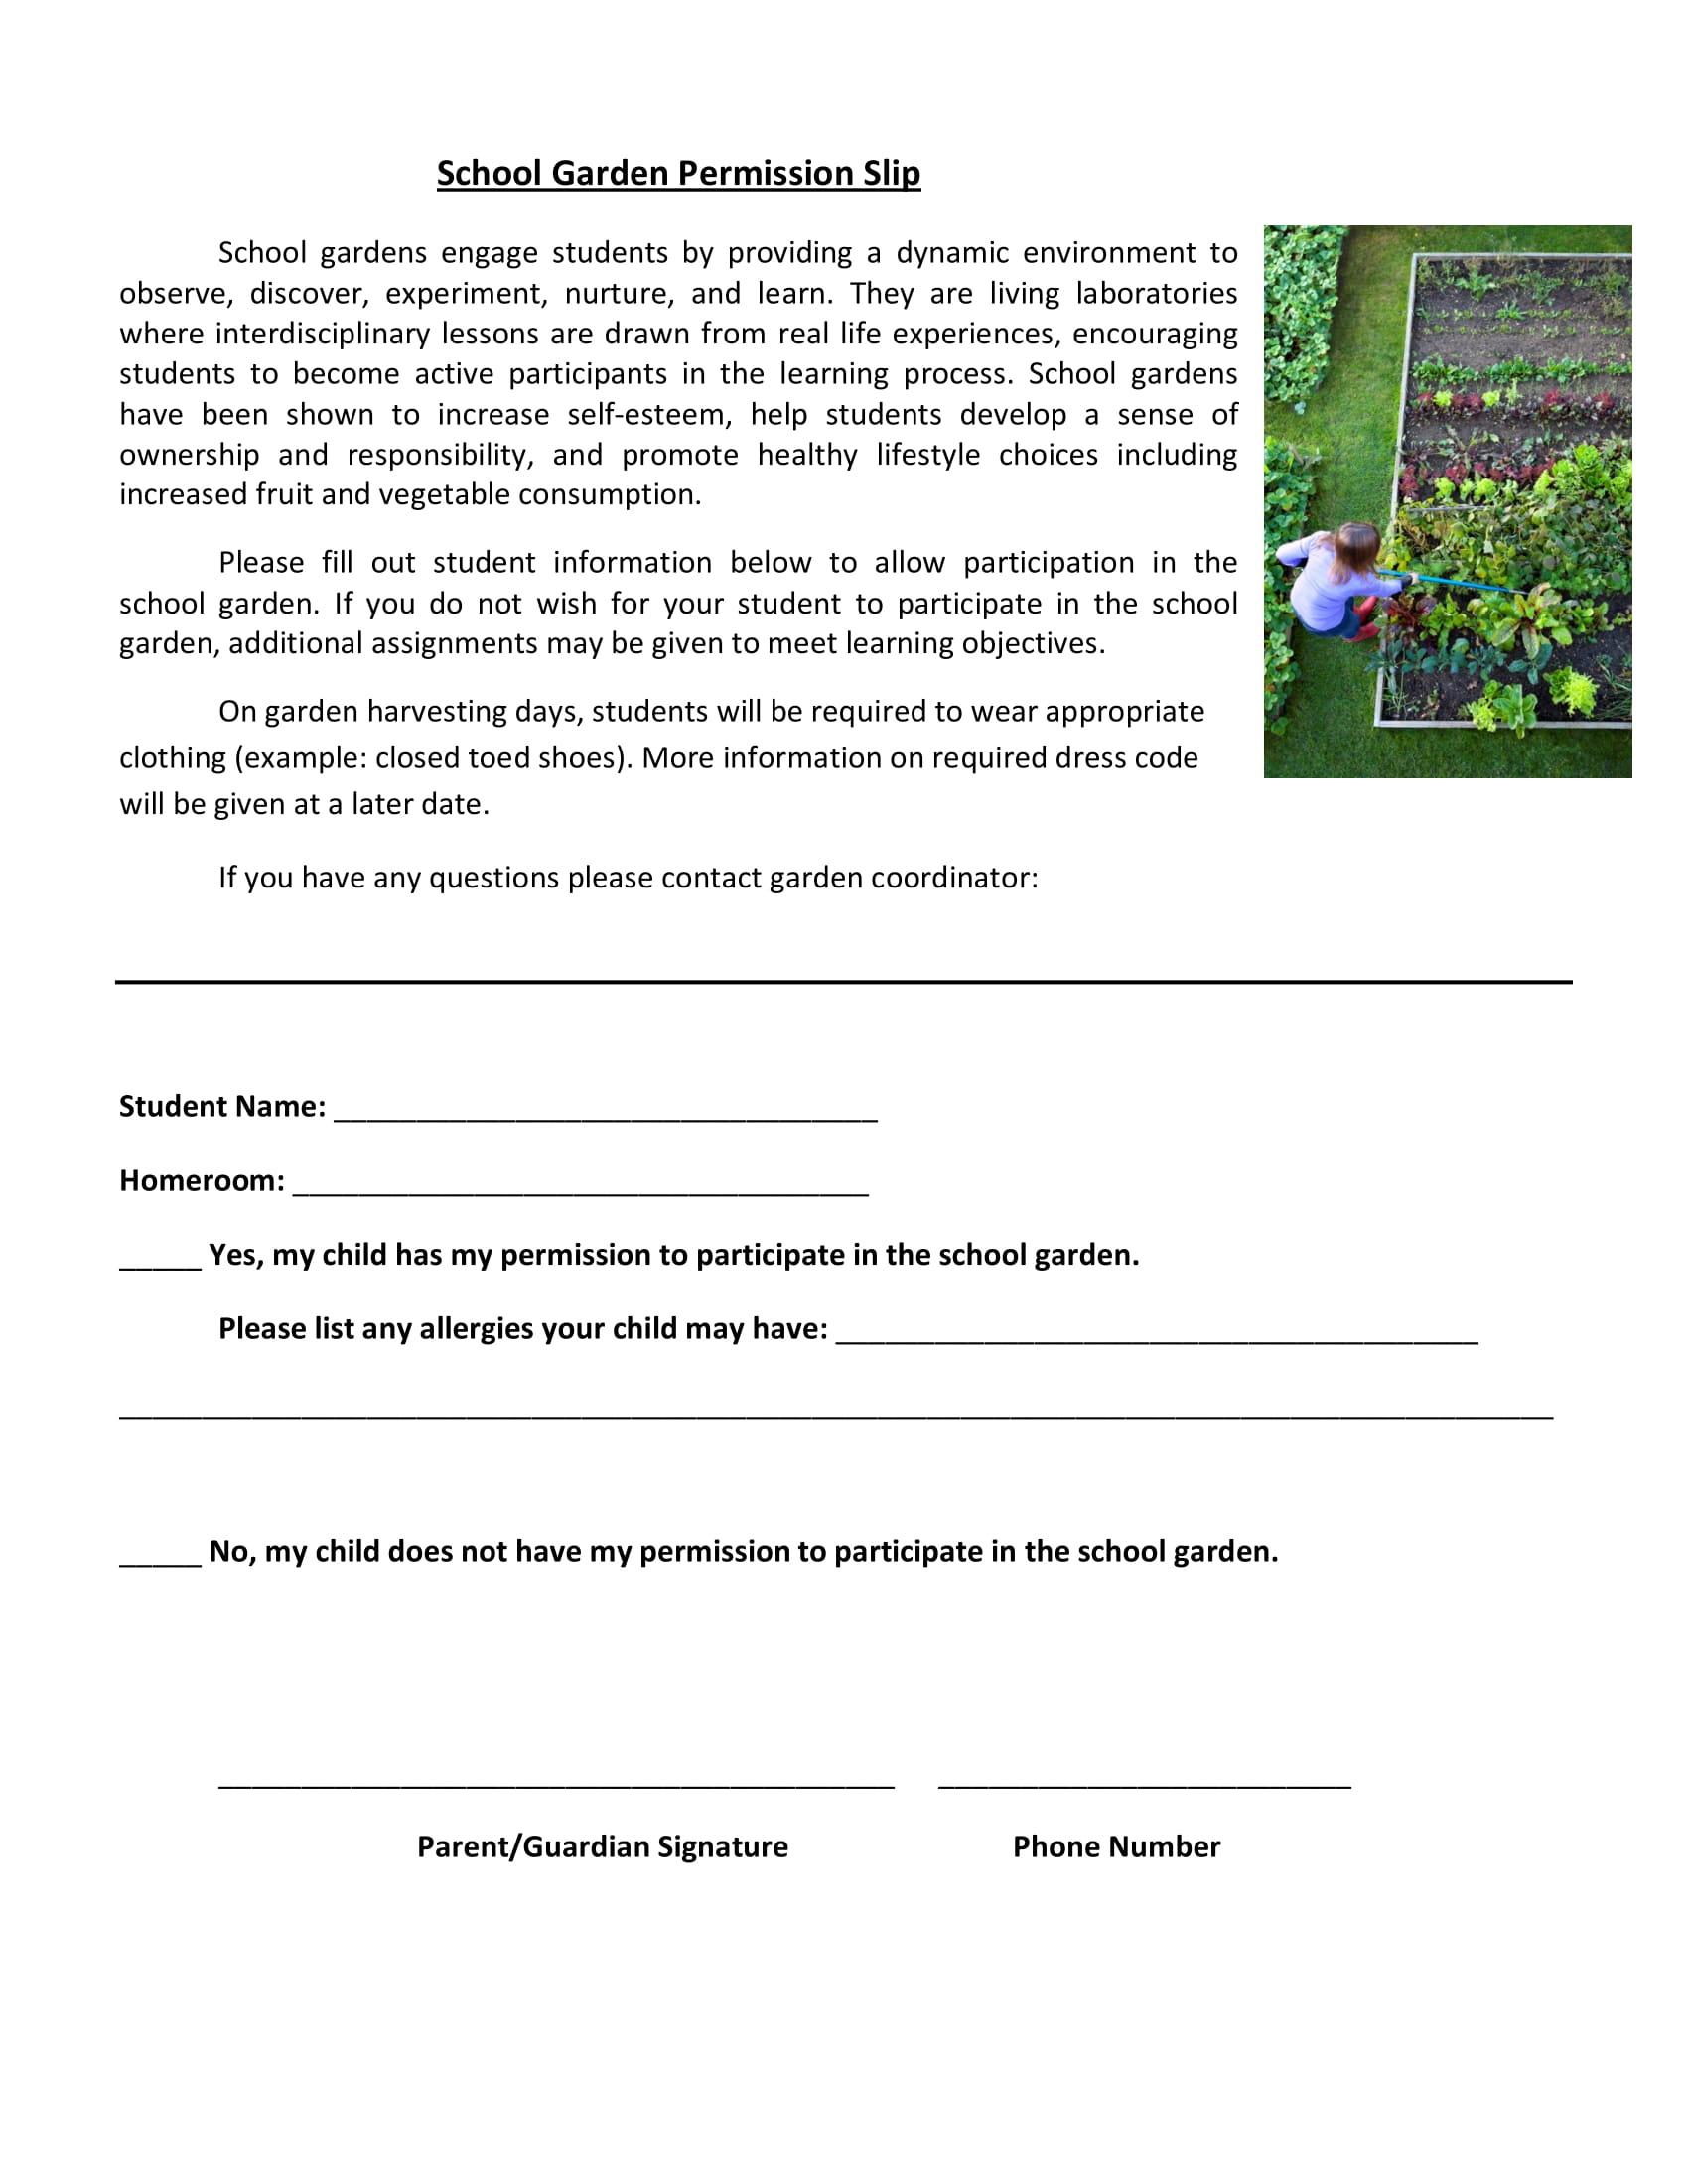 school garden permission slip example